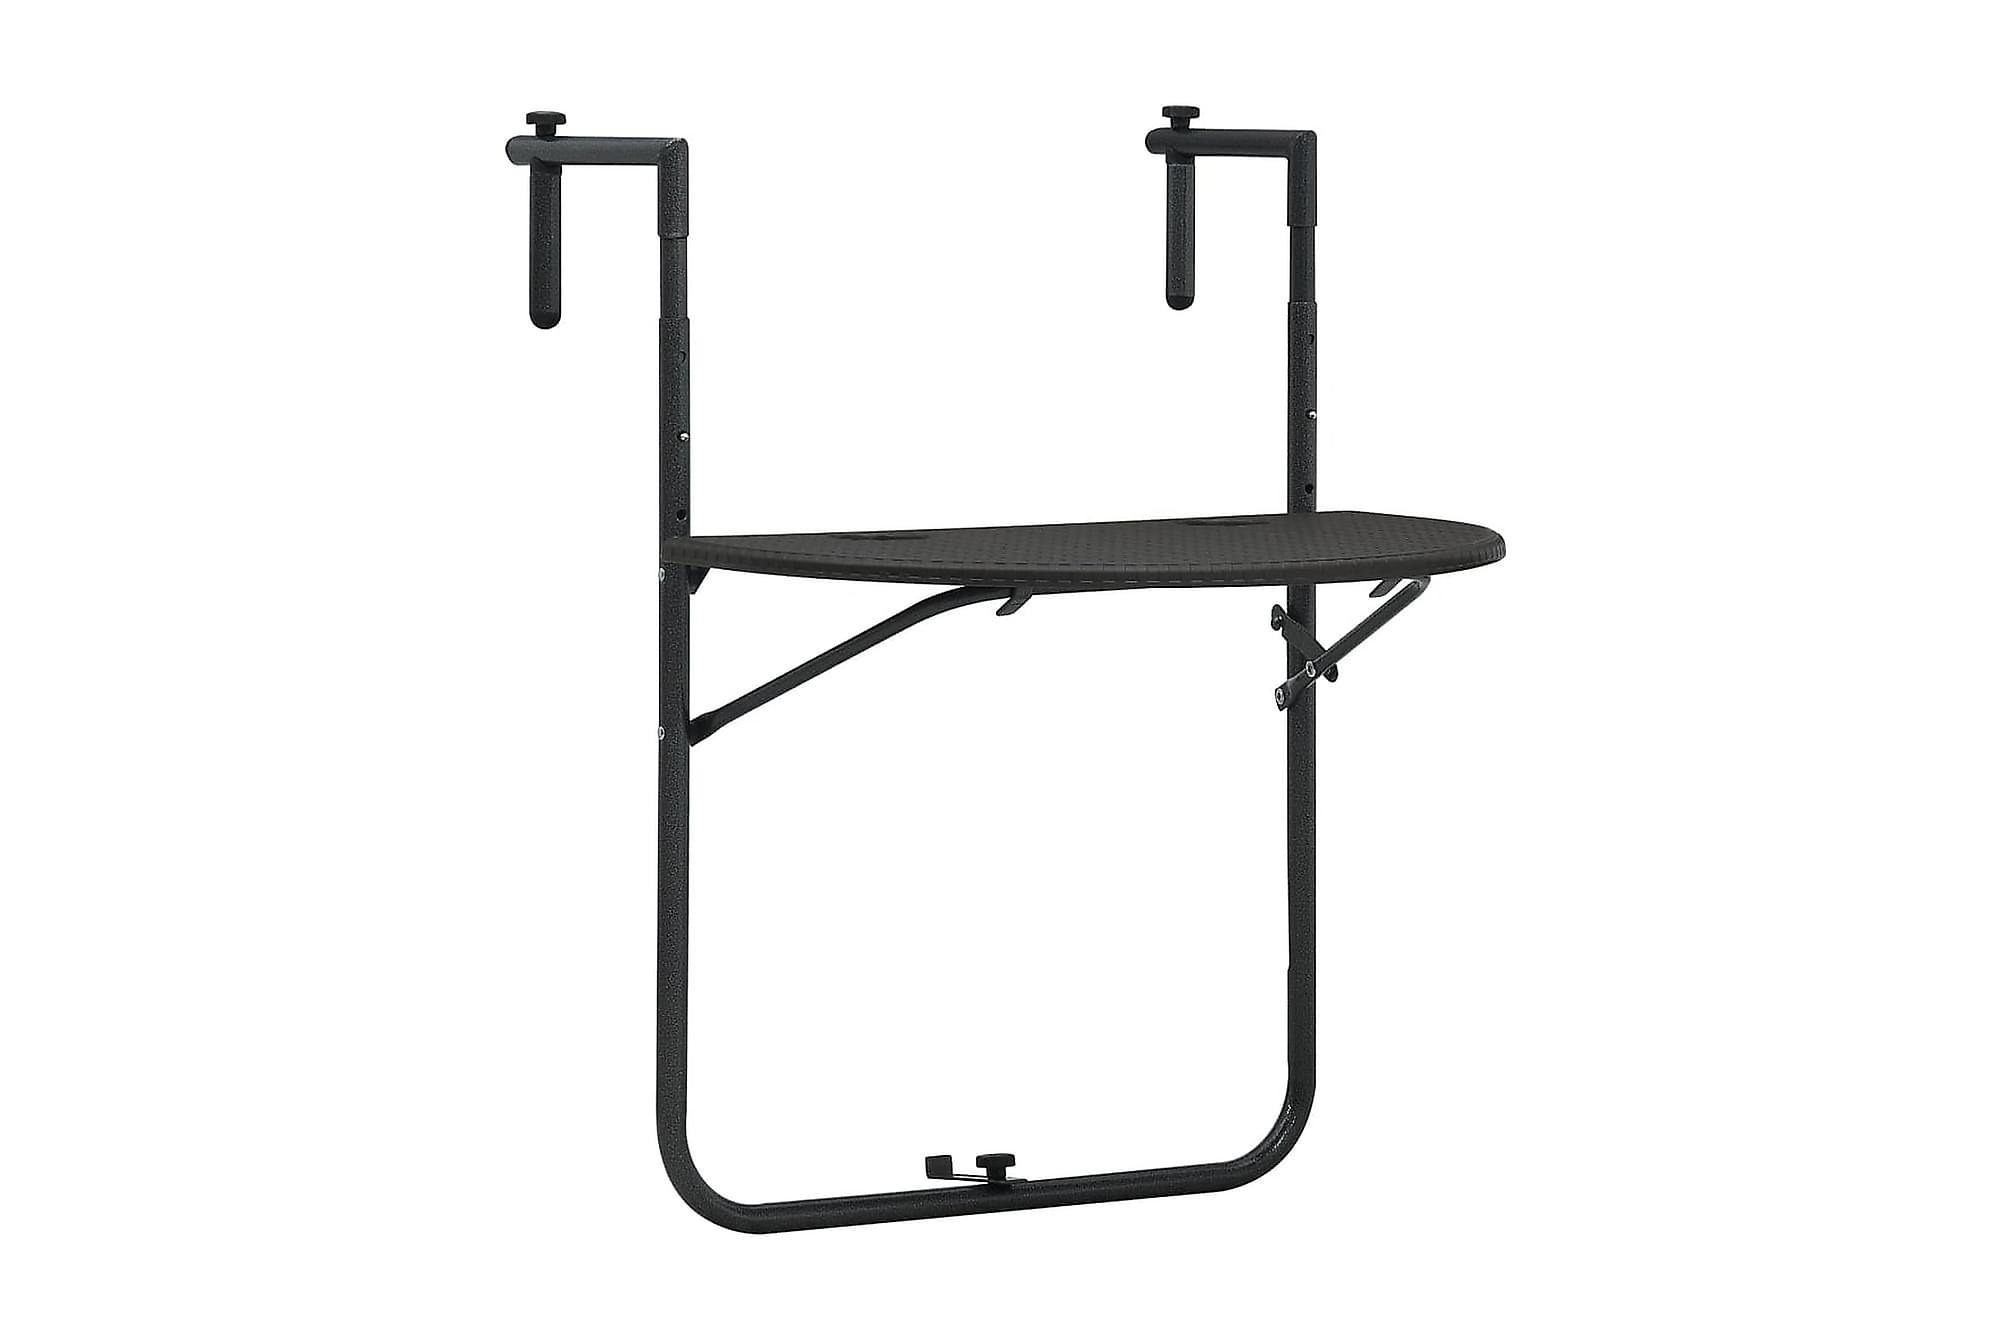 Balkongbord brun 60x64x83,5 cm plast konstrotting